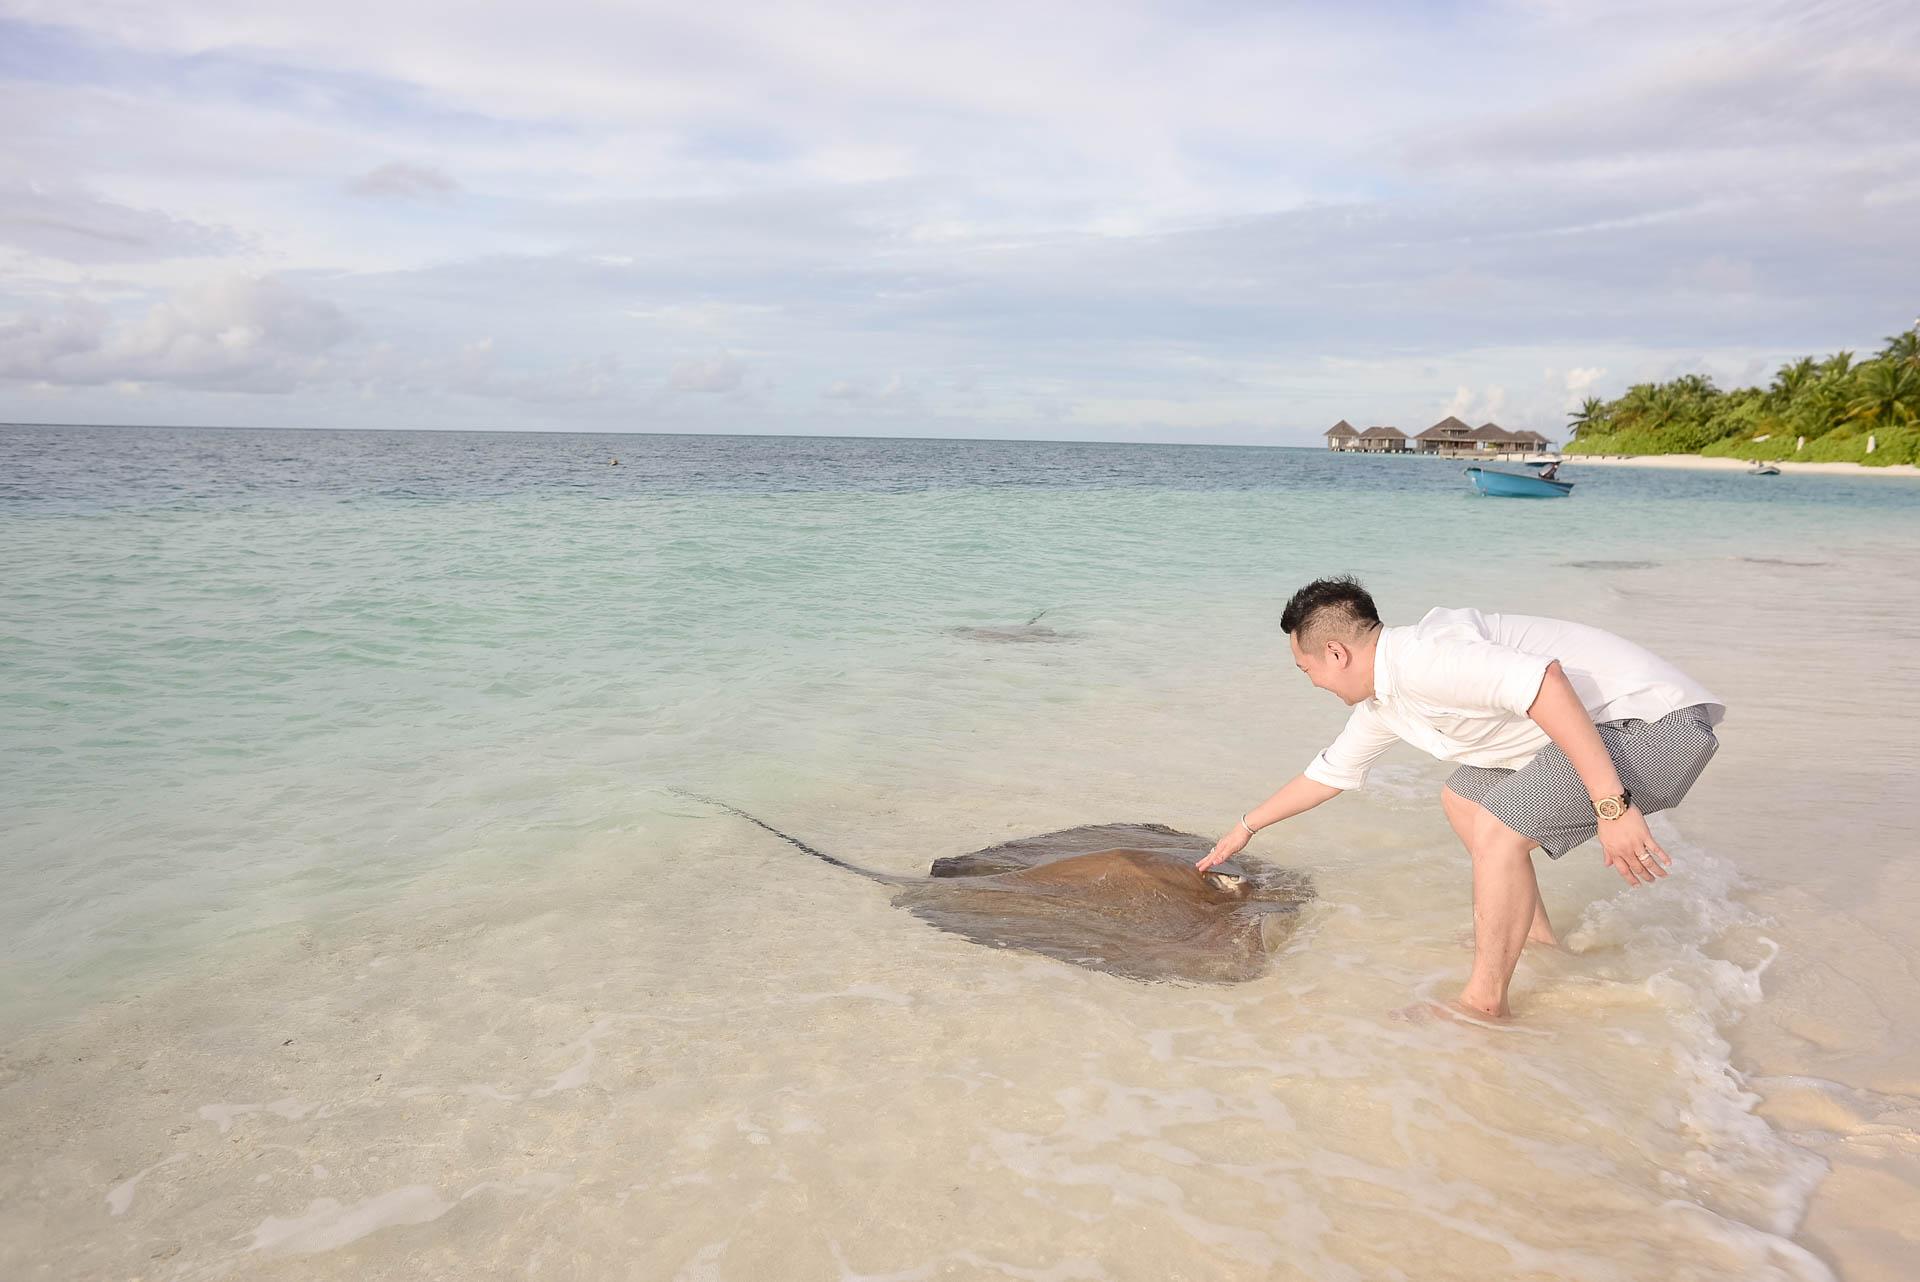 Chin Siew and Chin Yee Honeymoon in Maldives at Huvafen Fushi Resort Under Water Spa 31